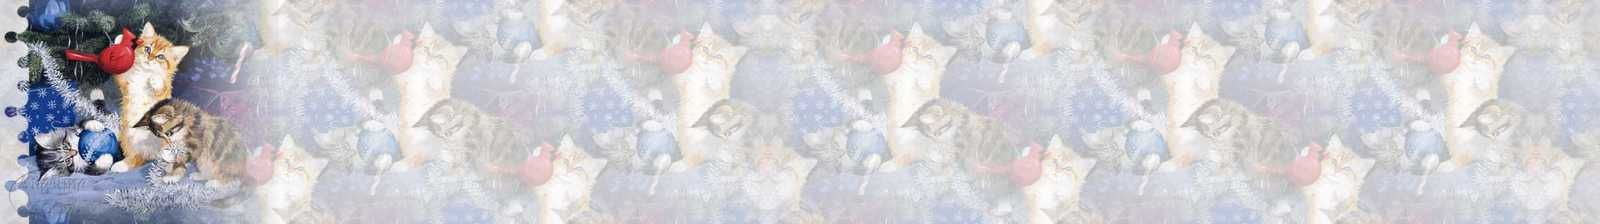 Thème Noël Incredimail &amp&#x3B; Papier A4 h l &amp&#x3B; outlook &amp&#x3B; enveloppe &amp&#x3B; 2 cartes A5 &amp&#x3B; signets 3 langues plus Noël multilangues  th_noel_persis_clayton_weirs_the_undecorators